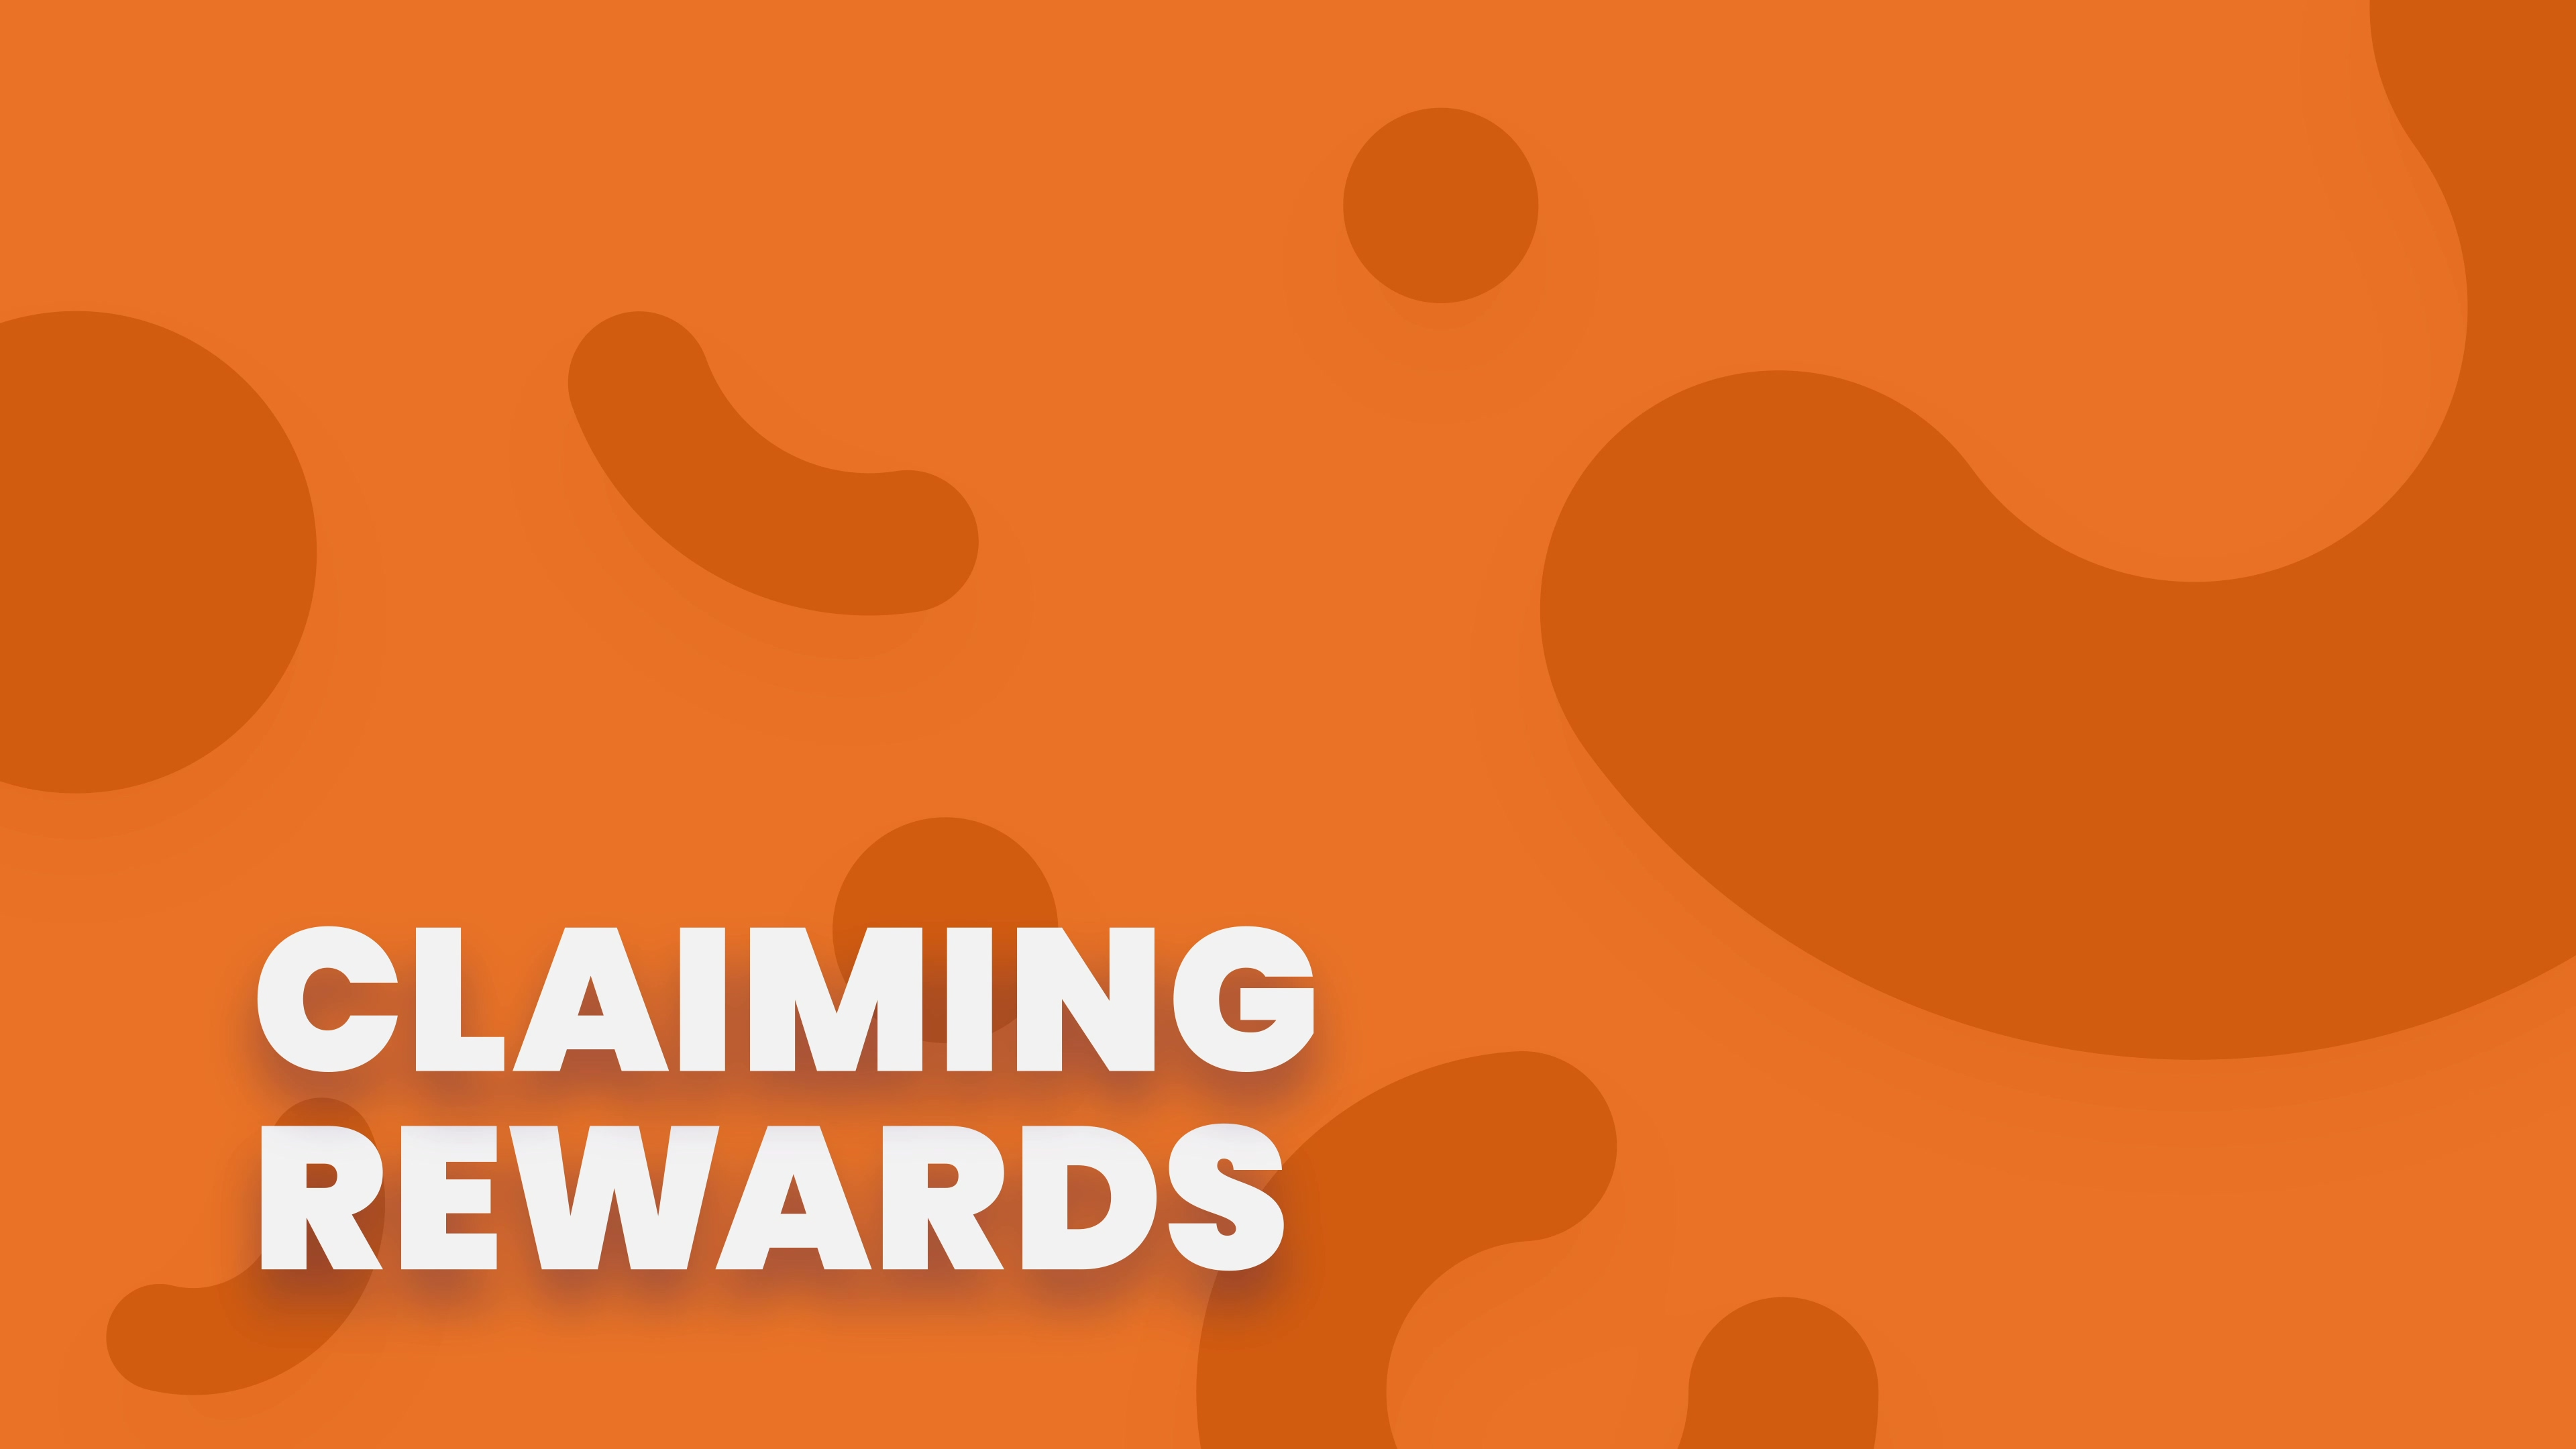 Claiming Rewards